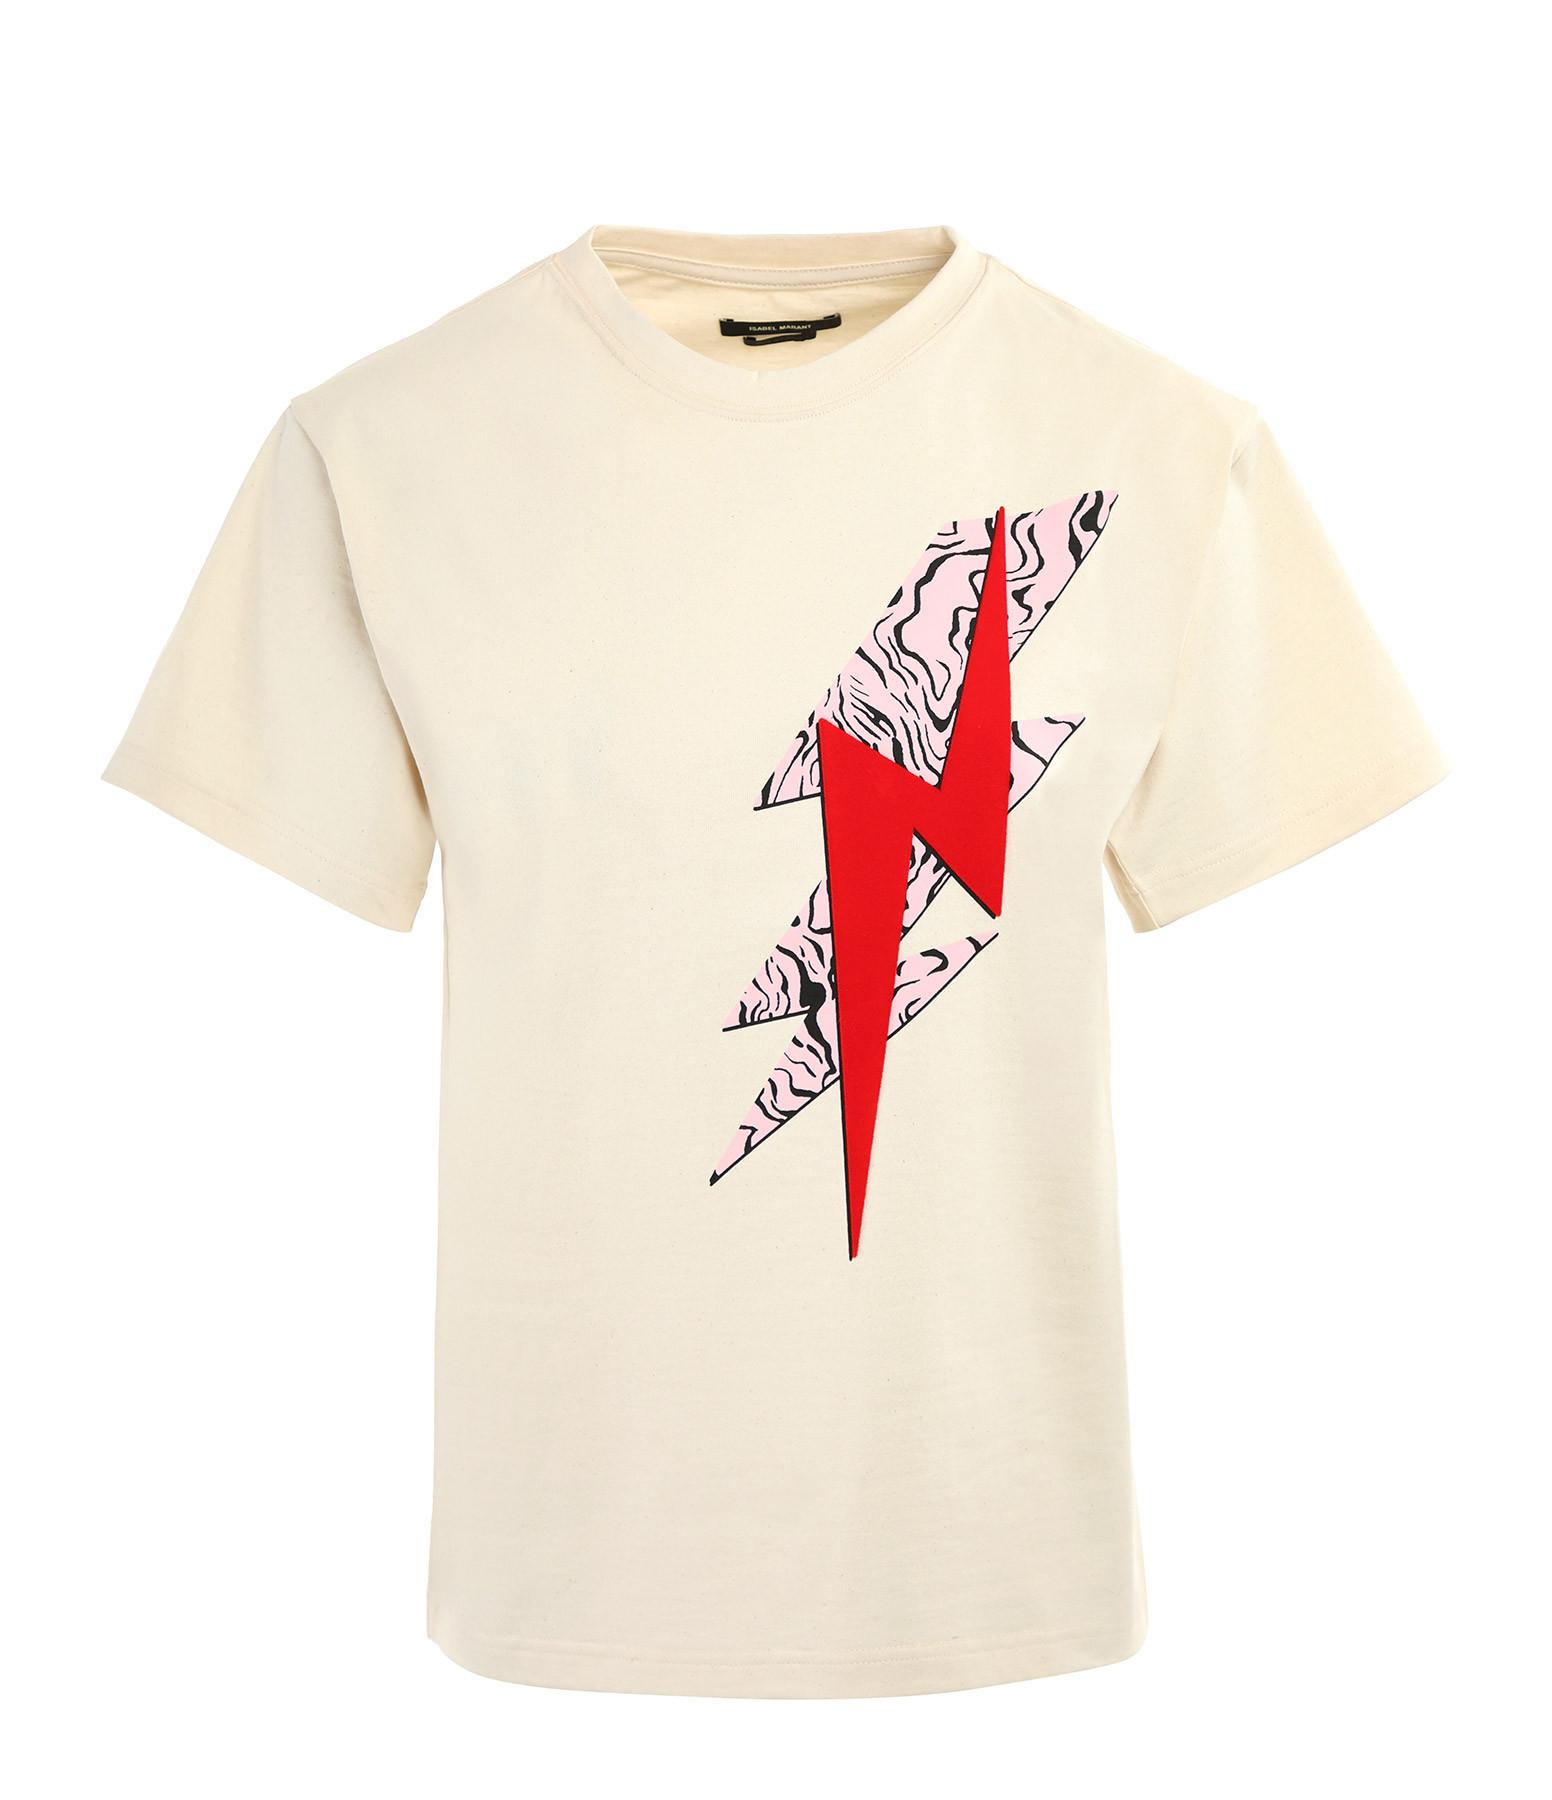 ISABEL MARANT - Tee-shirt Yates Coton Ecru